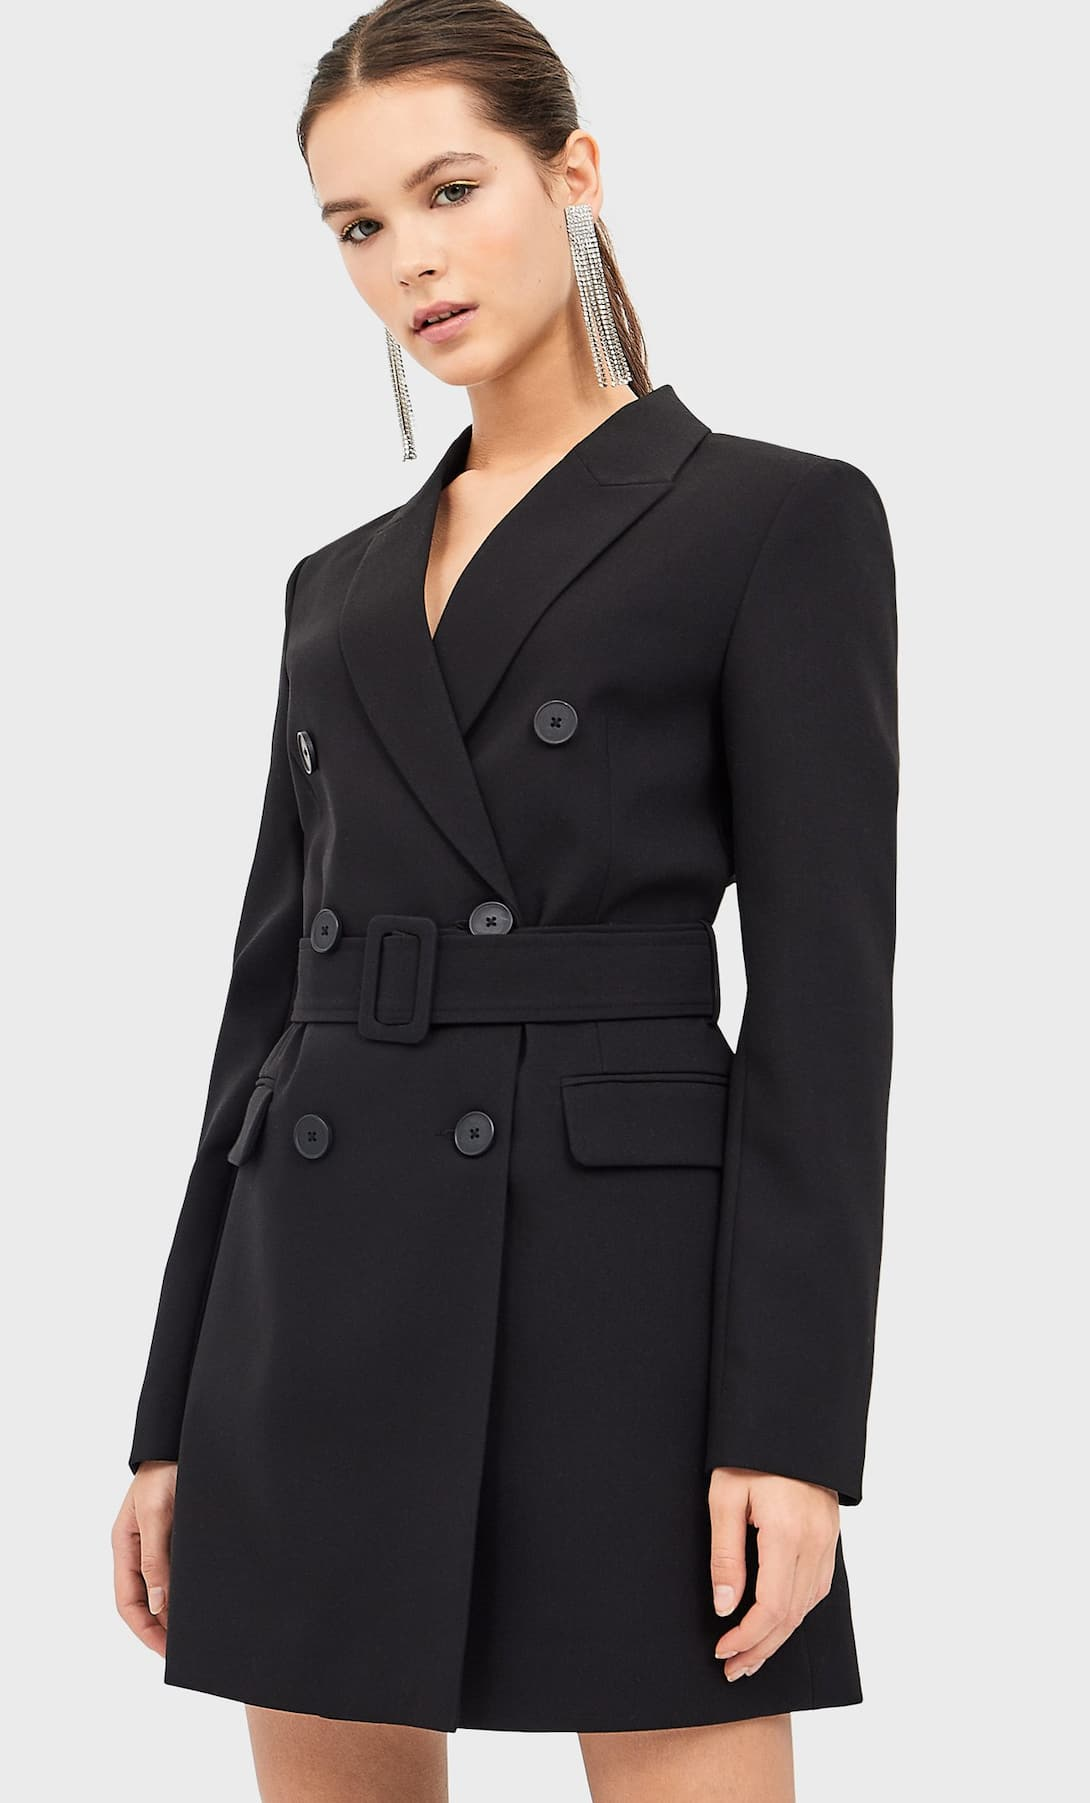 veste robe noire